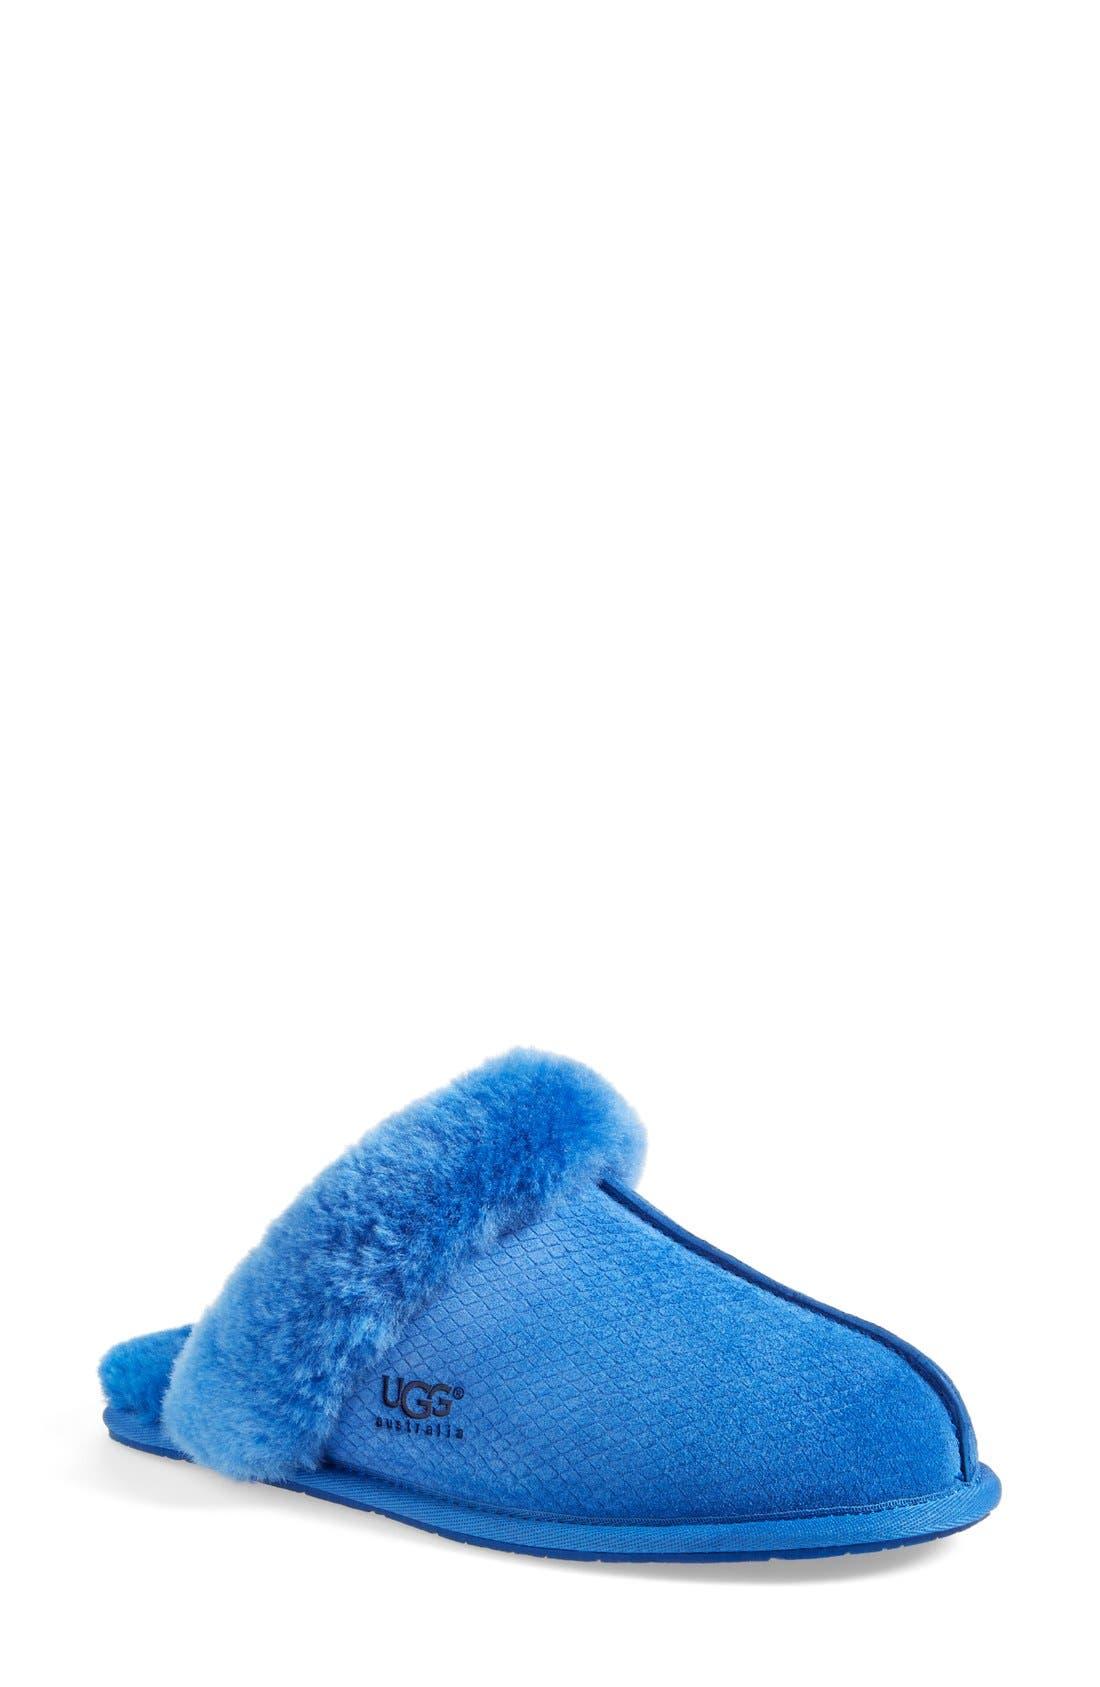 Australia Scuffette II - Exotic Genuine Calf Hair Slipper,                             Main thumbnail 3, color,